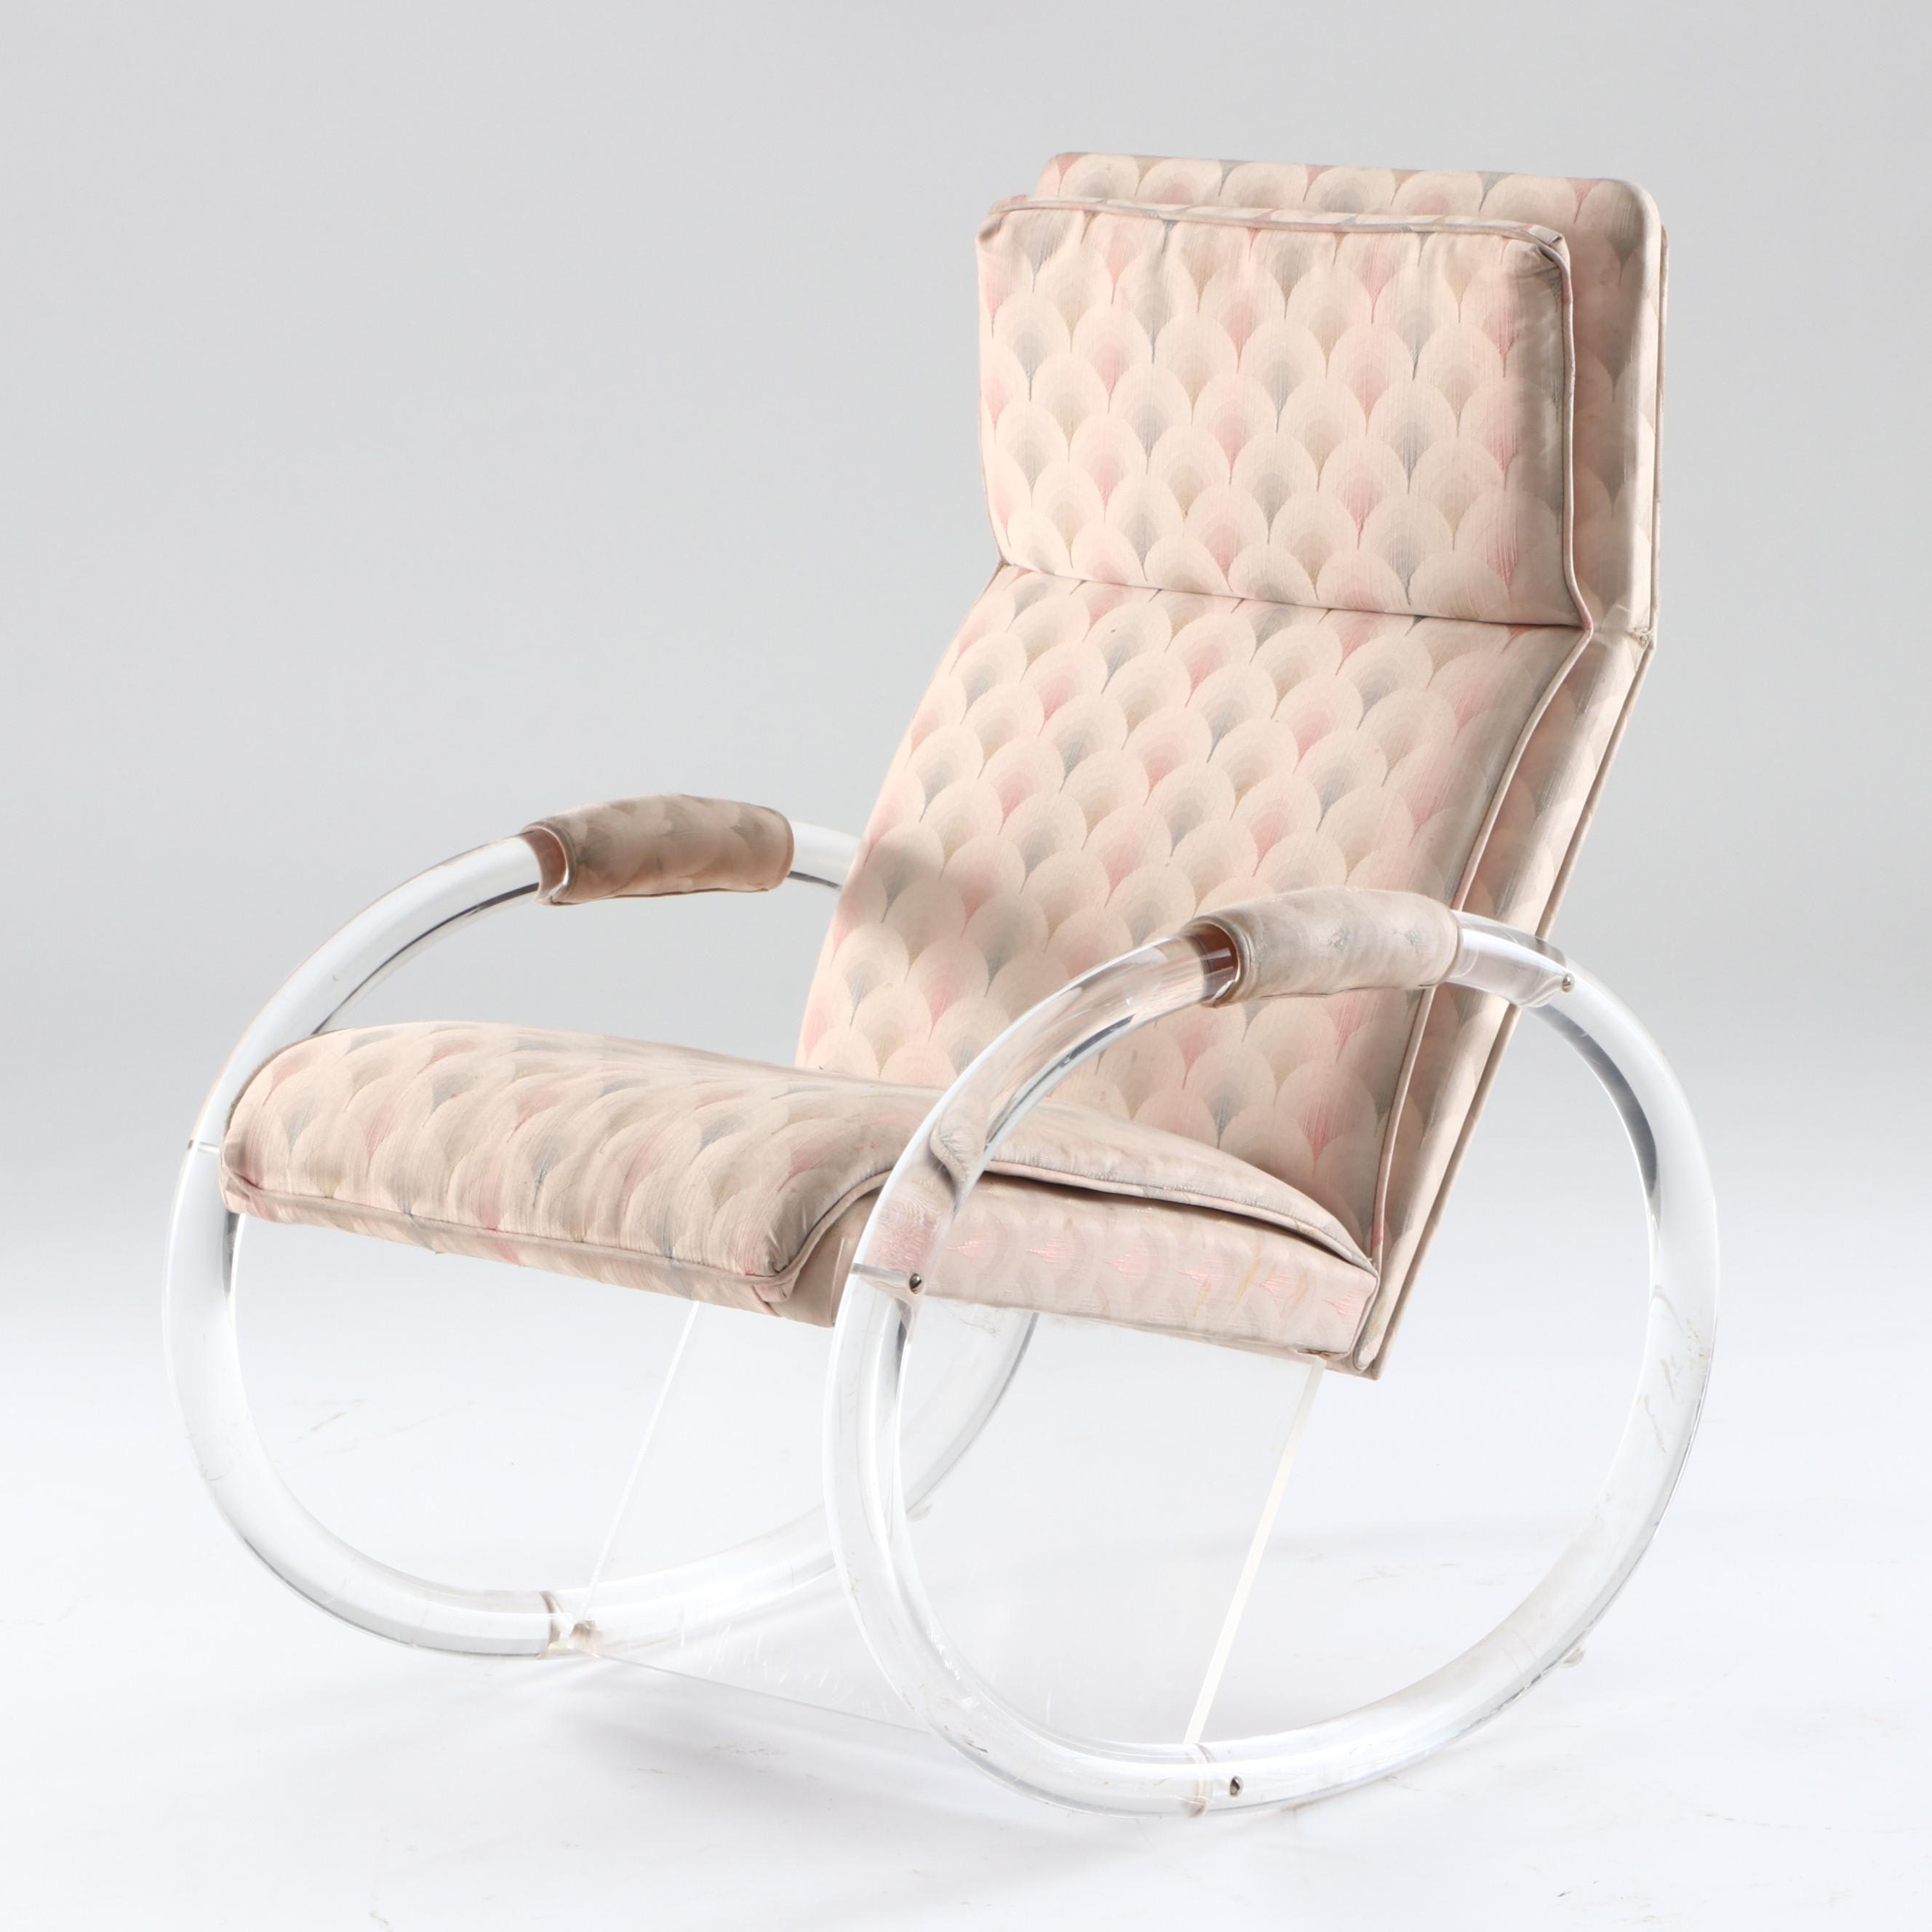 Mid Century Modern Lucite Frame Rocking Chair after Charles Hollis-Jones Design